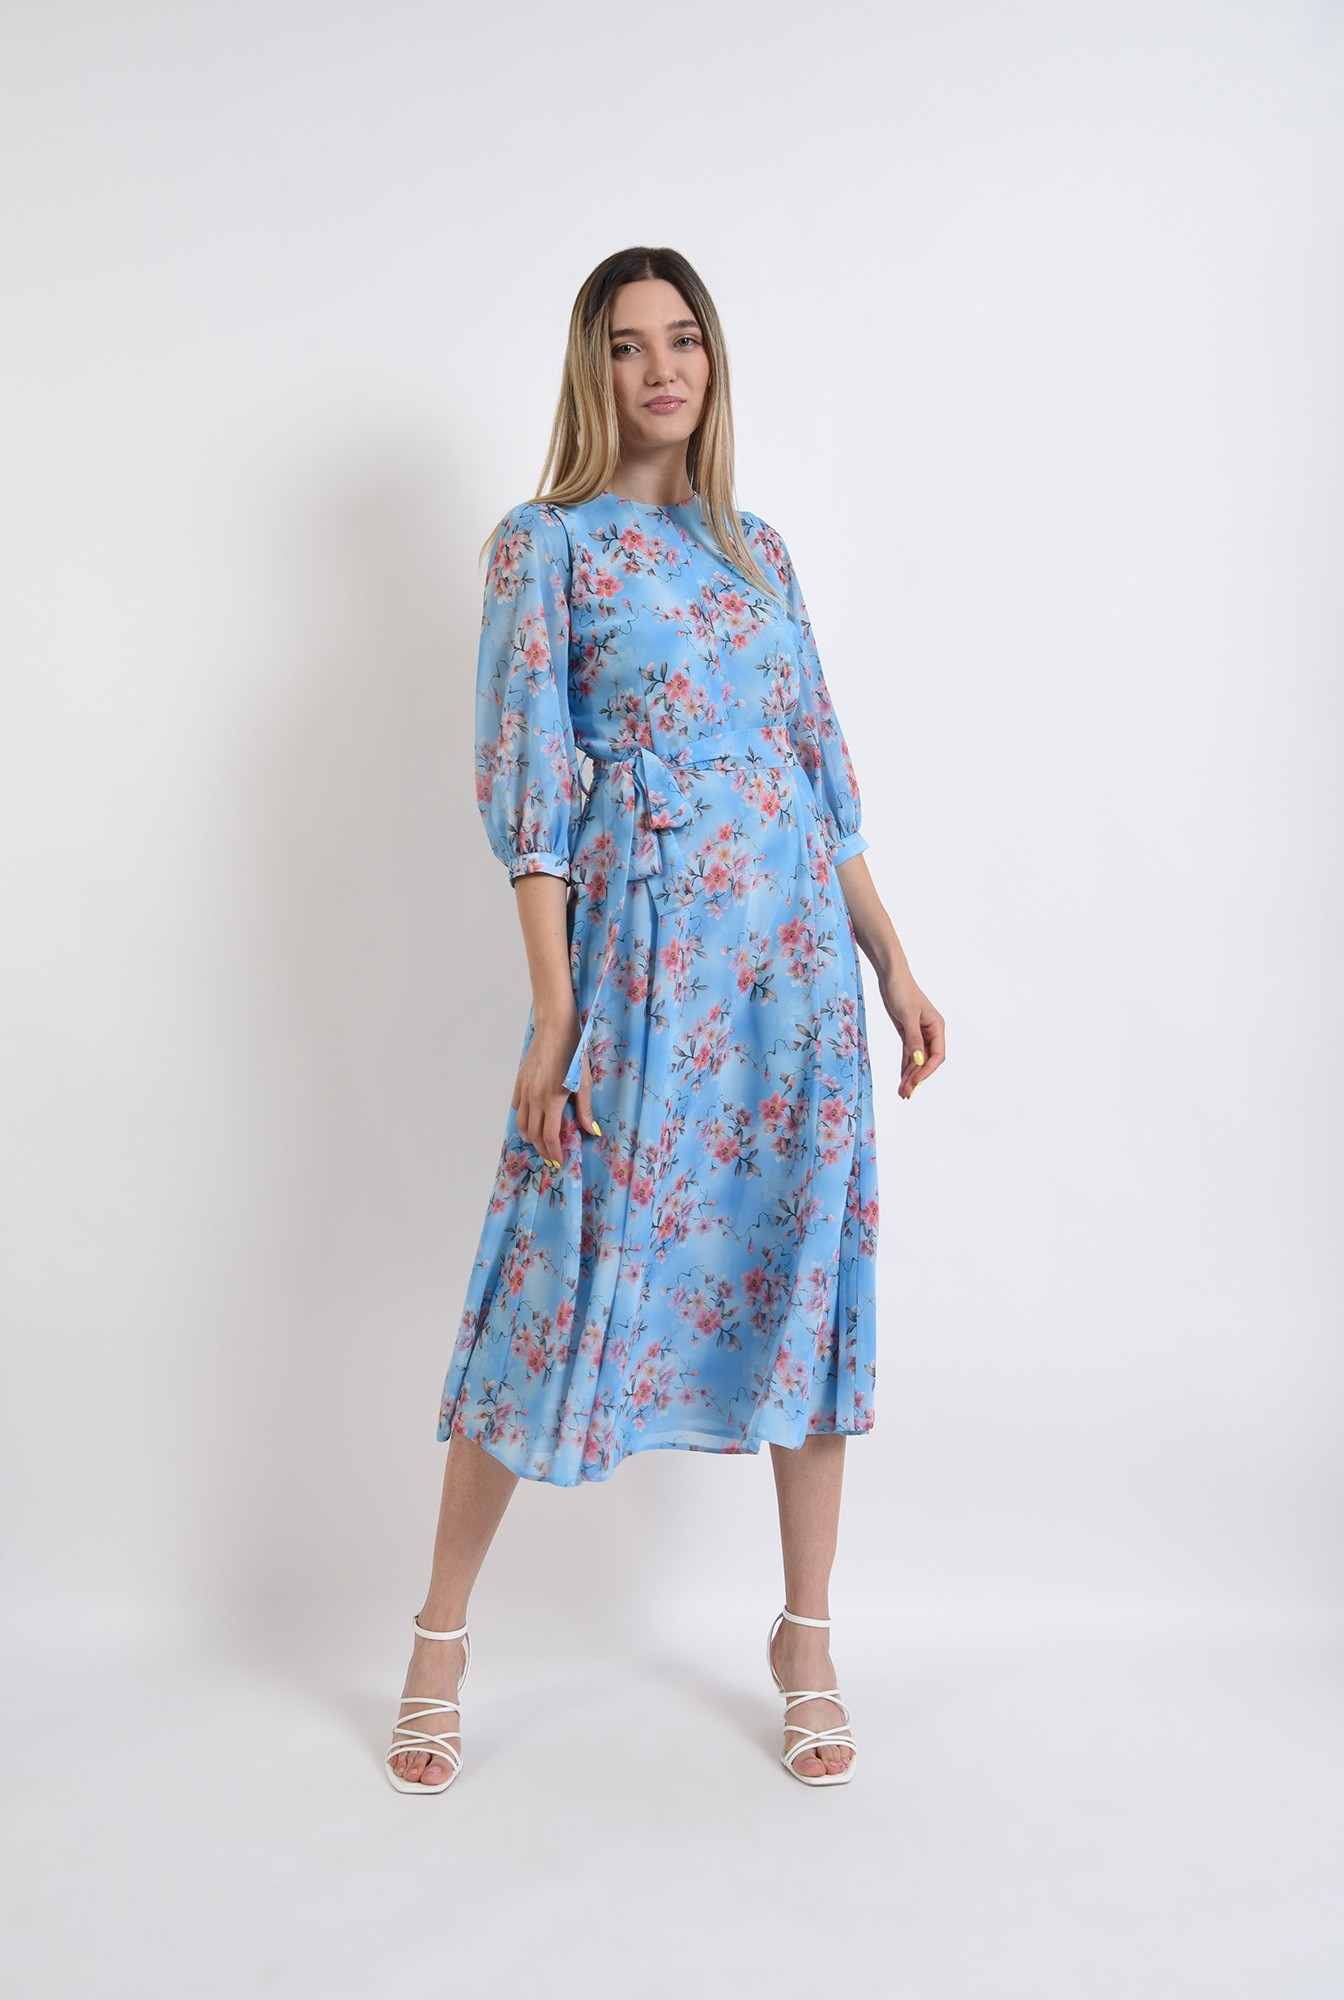 3 - rochie eleganta, poema, bleu, cu flori, midi